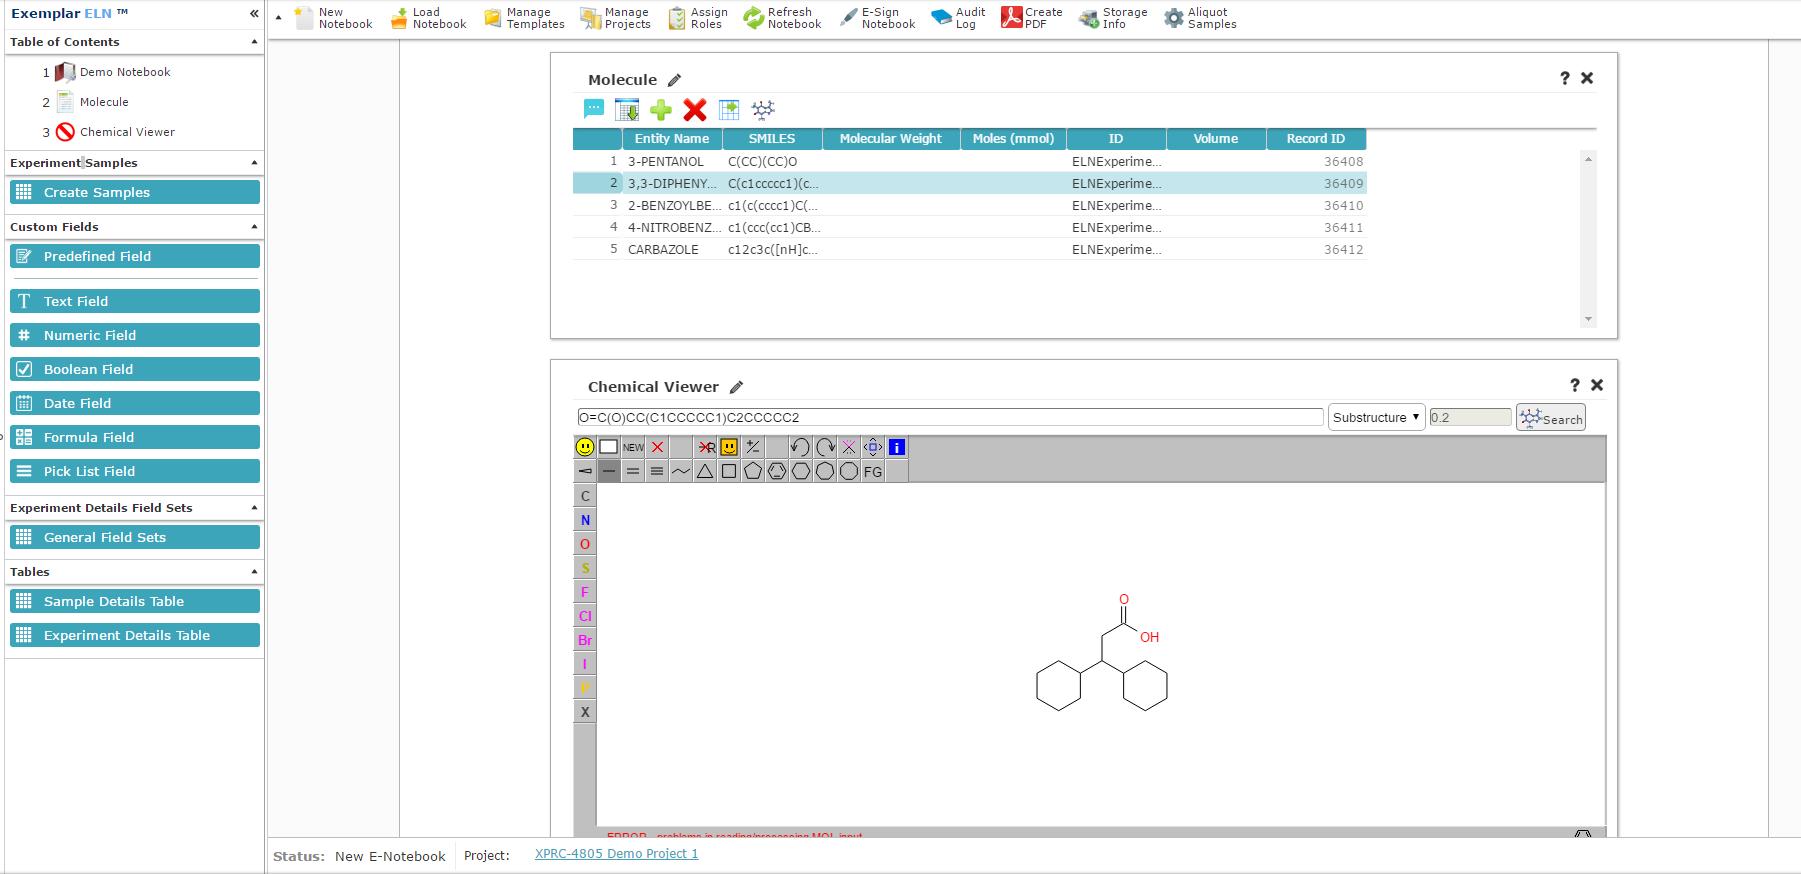 Exemplar LIMS screenshot: Exemplar LIMS electronic laboratory notebook